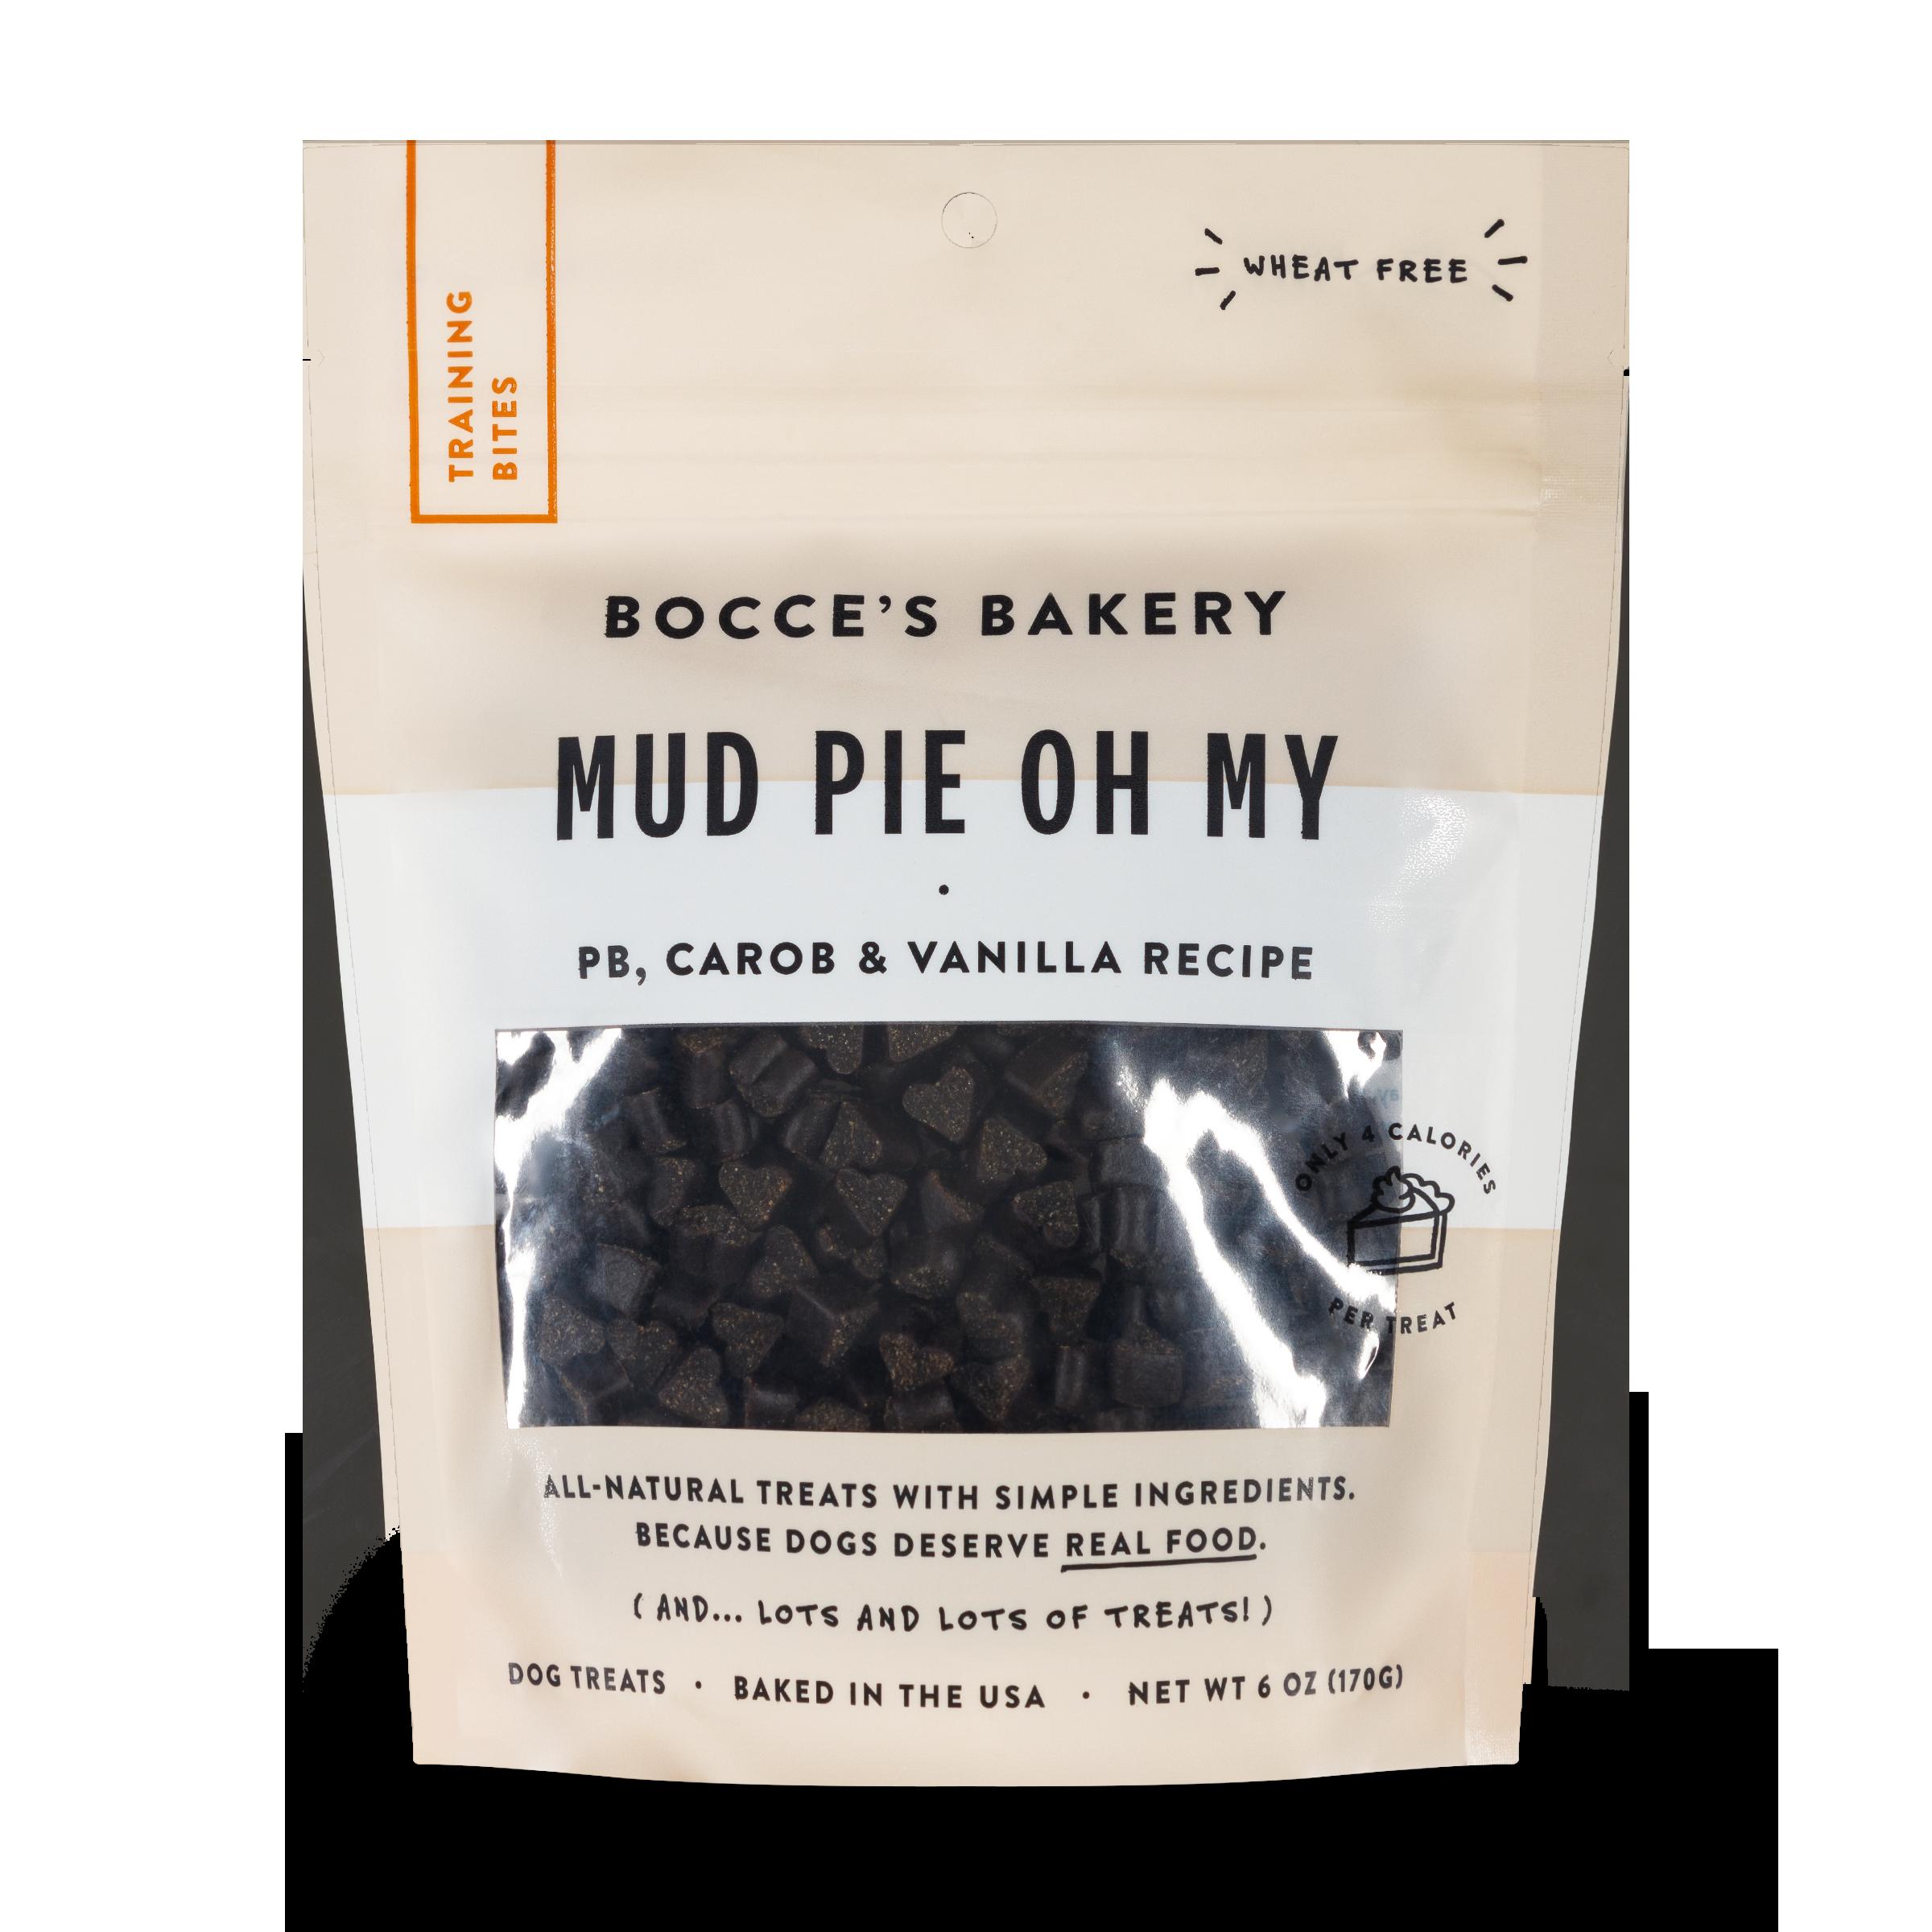 Bocce's Bakery Everyday Mud Pie Oh My Peanut Butter, Carob & Vanilla Recipe Training Bites Dog Treats, 6-oz